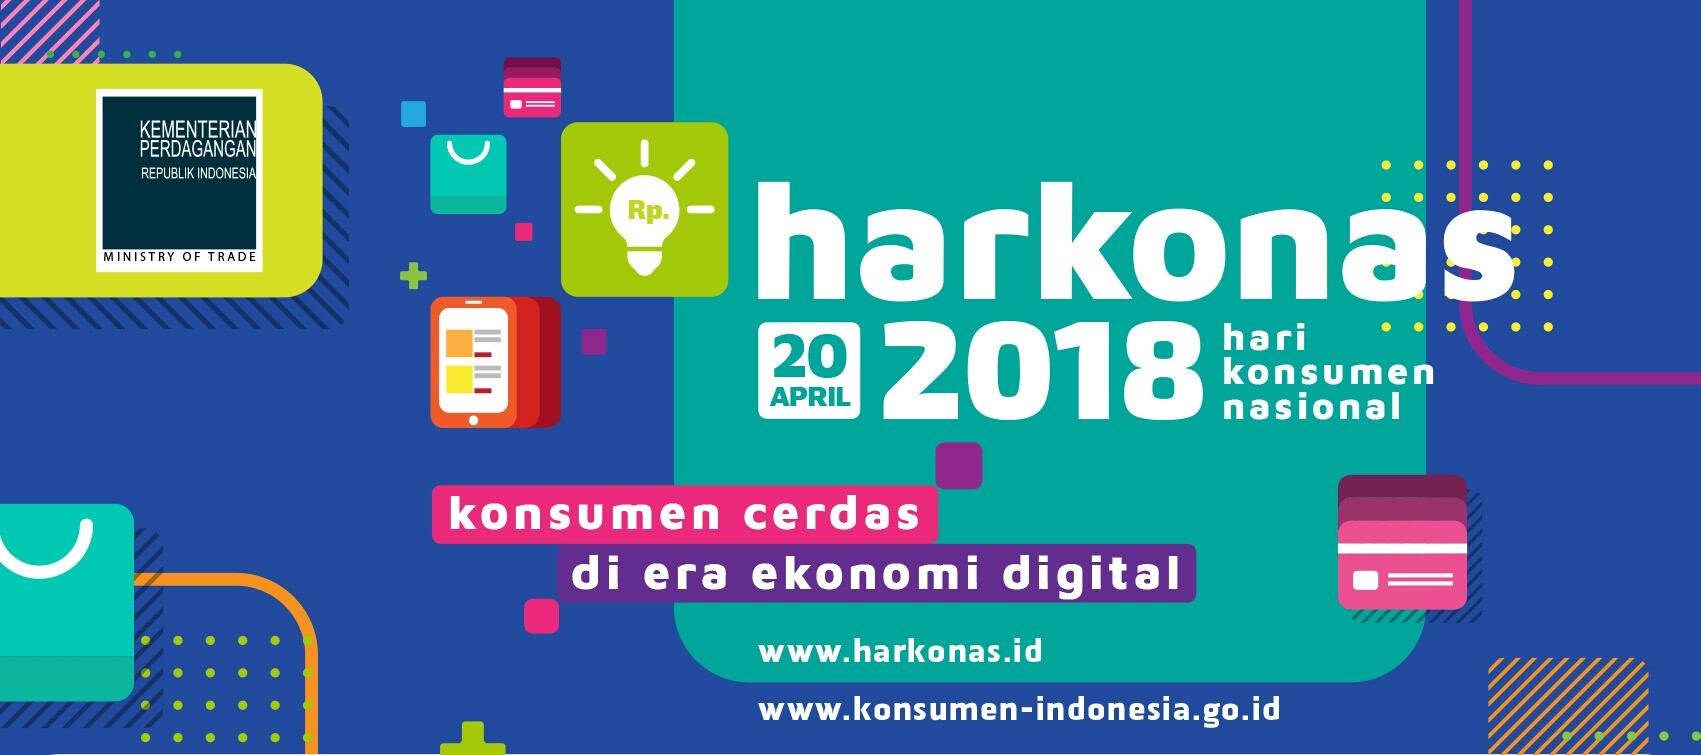 Hari Konsumen Nasional Harkonas 2018 GELORA SRIWIJAYA